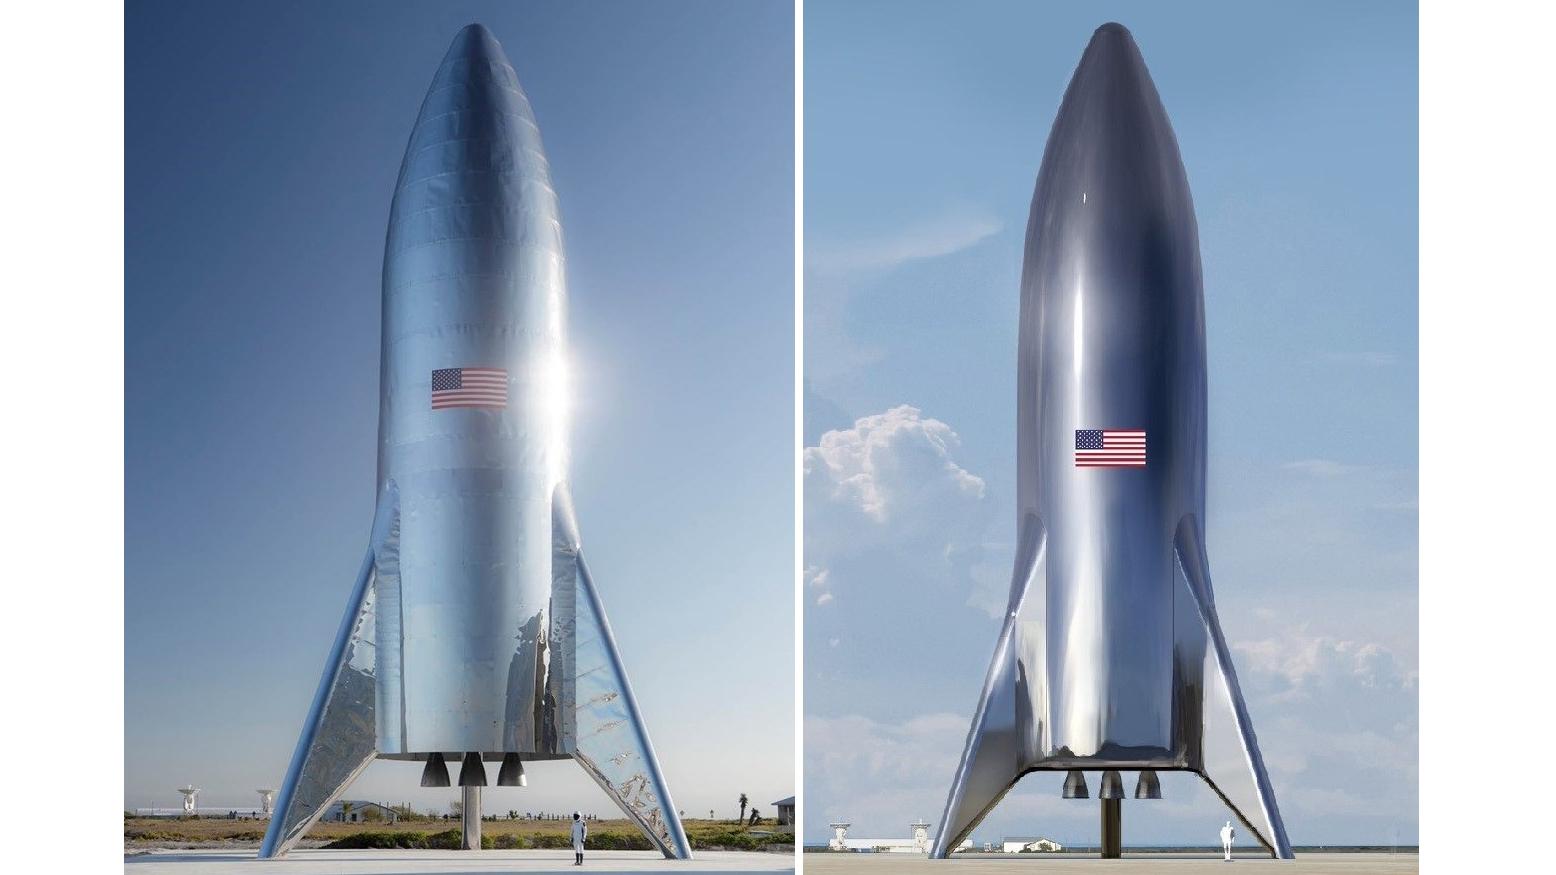 Elon Musk shares epic photograph of Starship spacecraft before arranged test flight